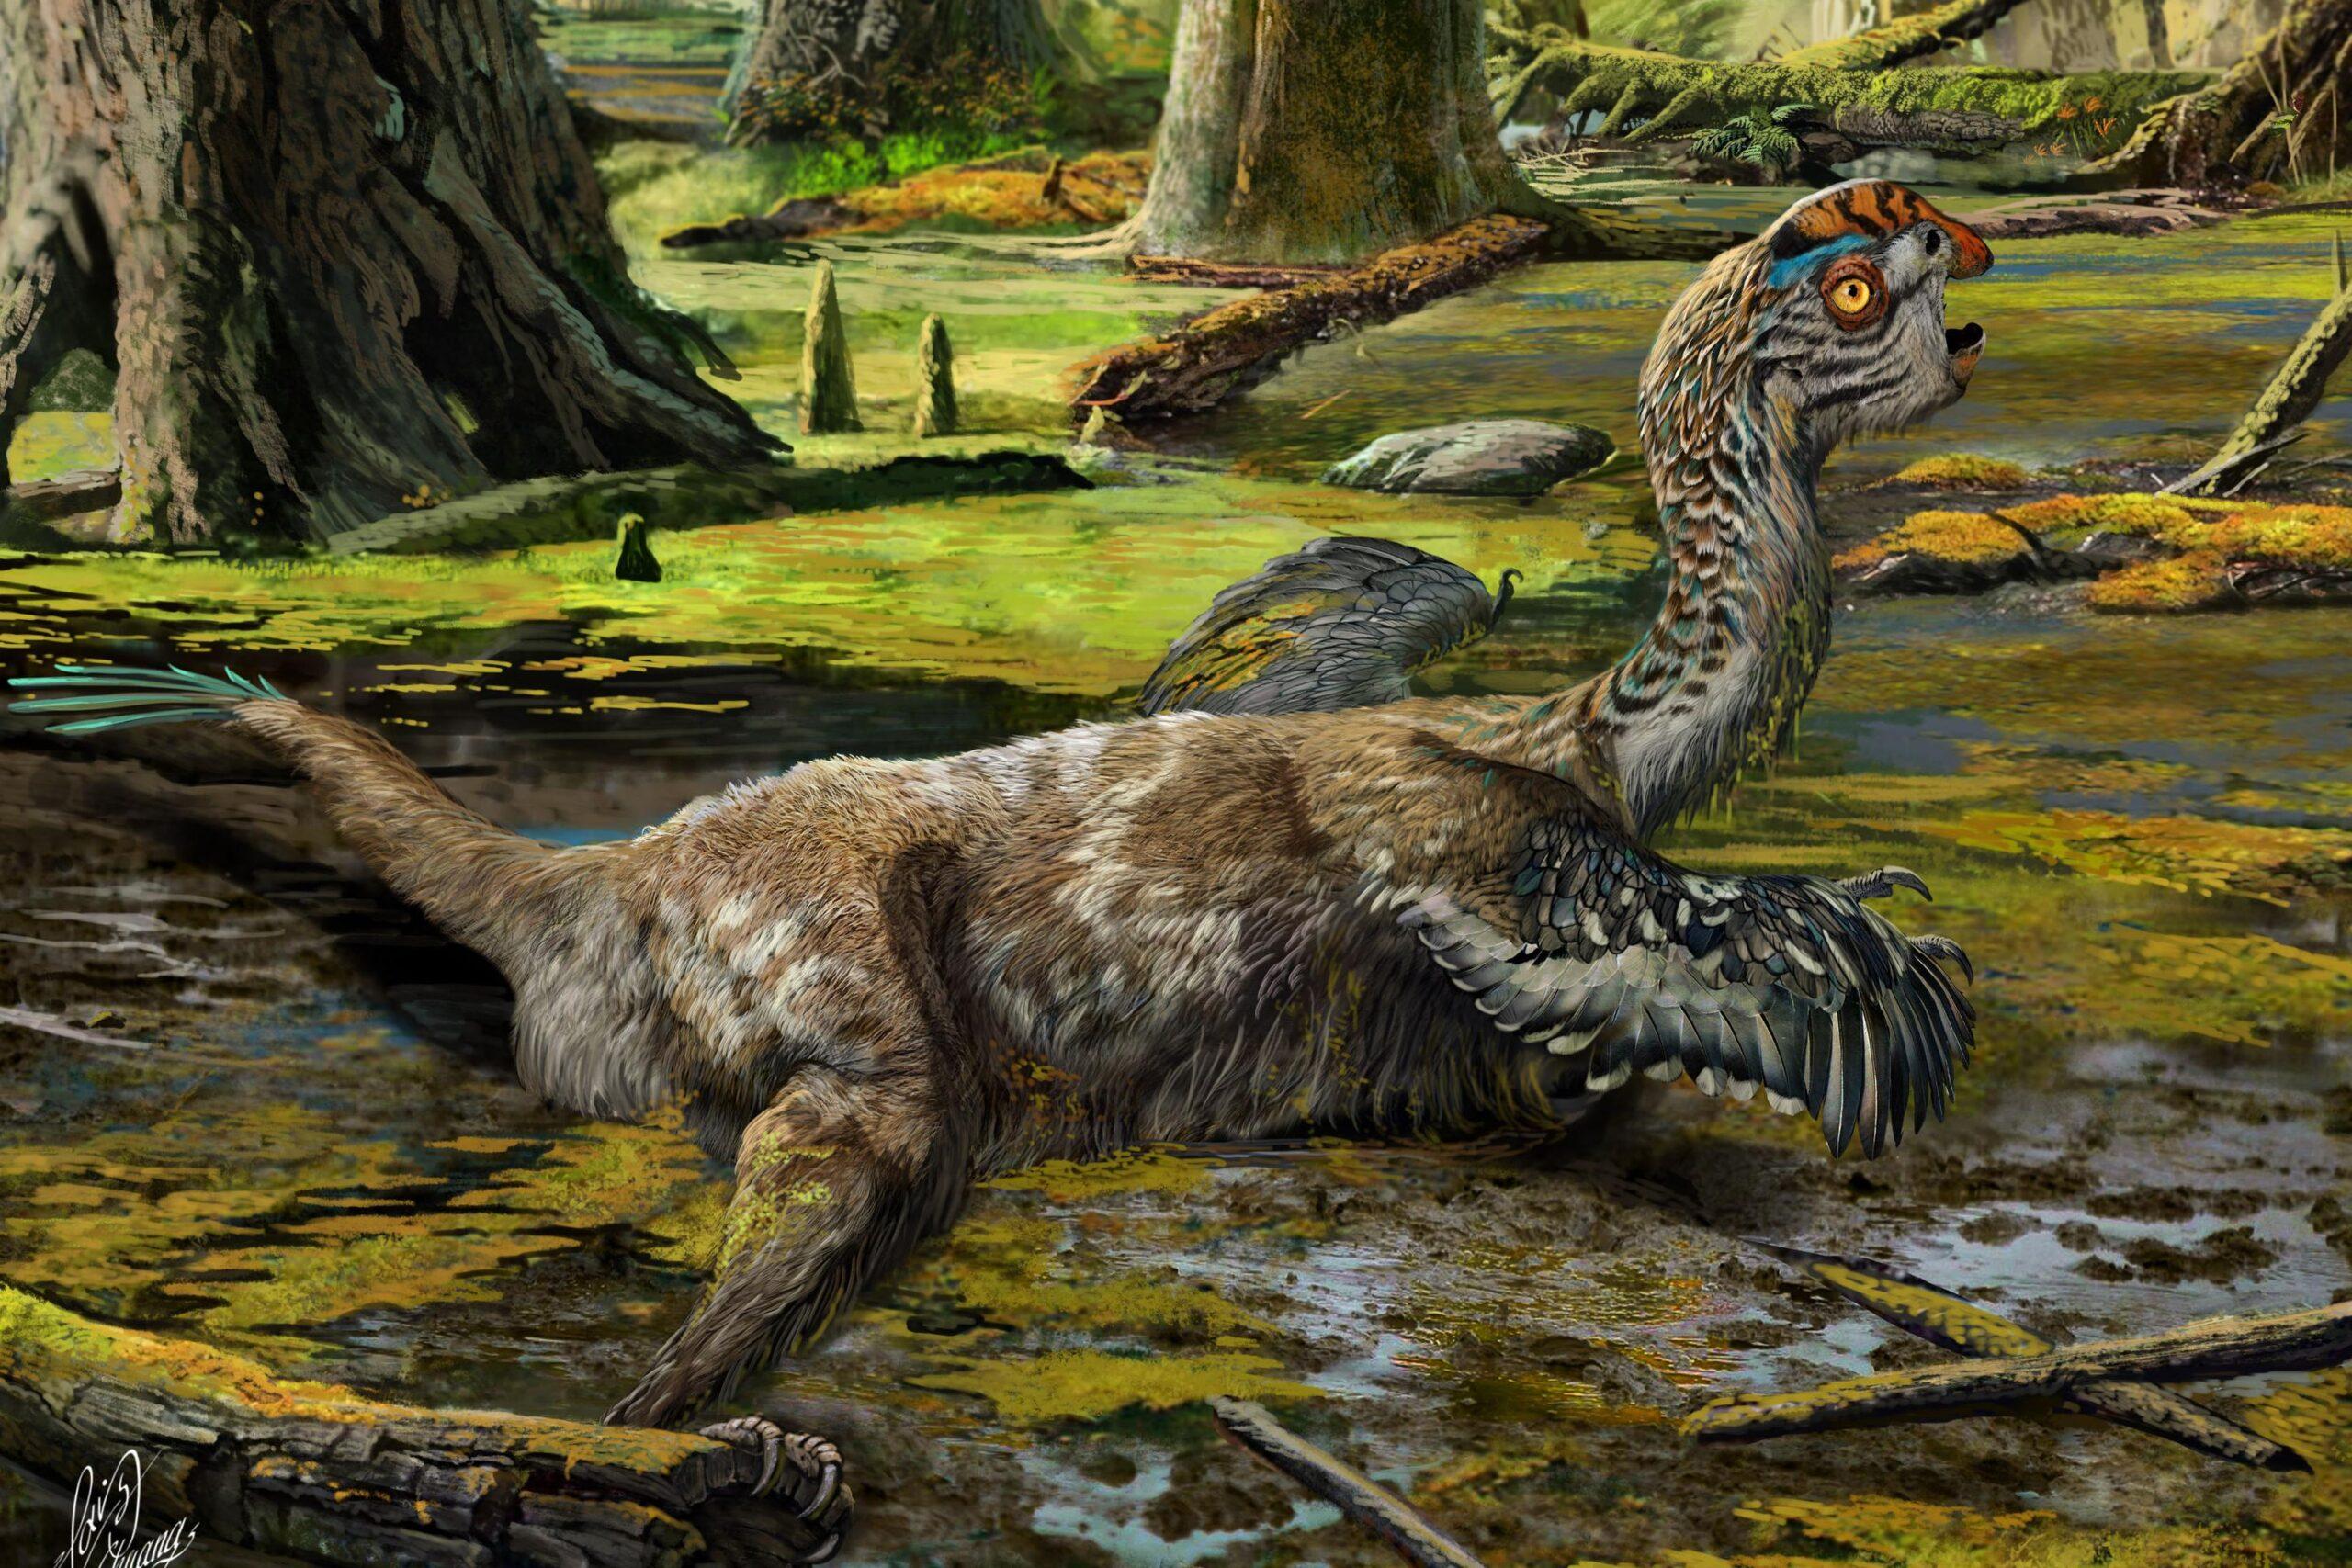 Oviraptorosaur Discovery in Mongolia!